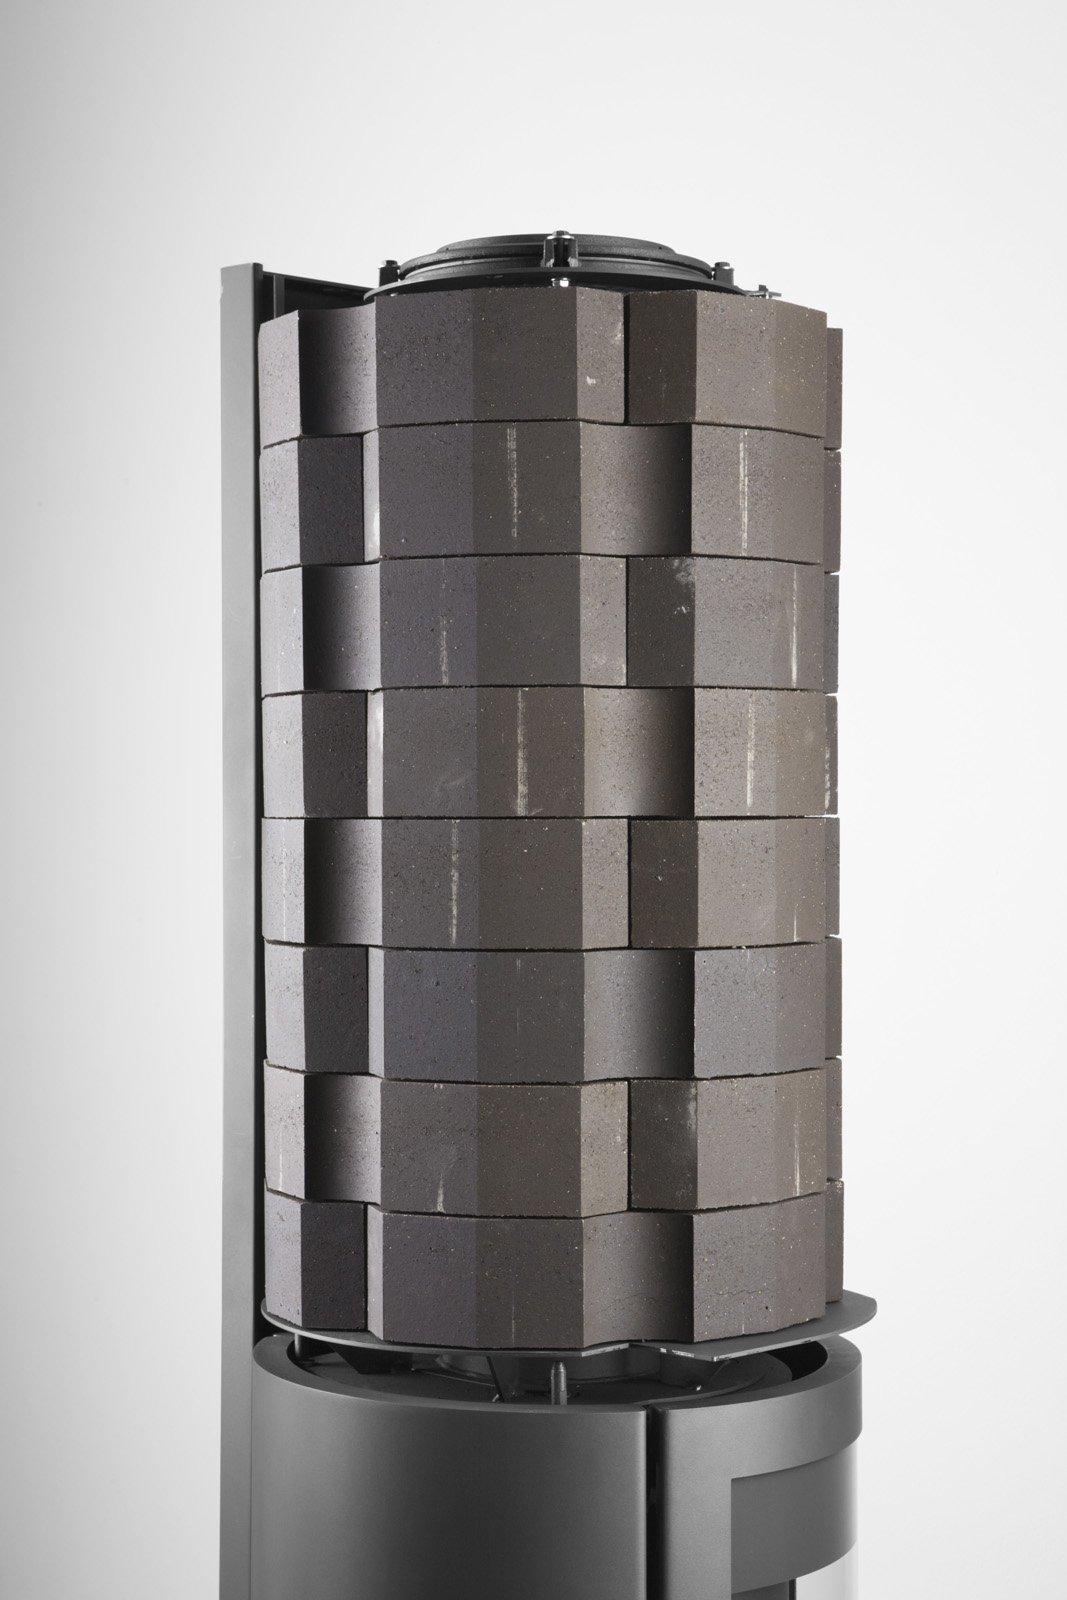 Stuv 30 compact h chevalier totem05 1 cose di casa - Prix stuv 30 compact h ...